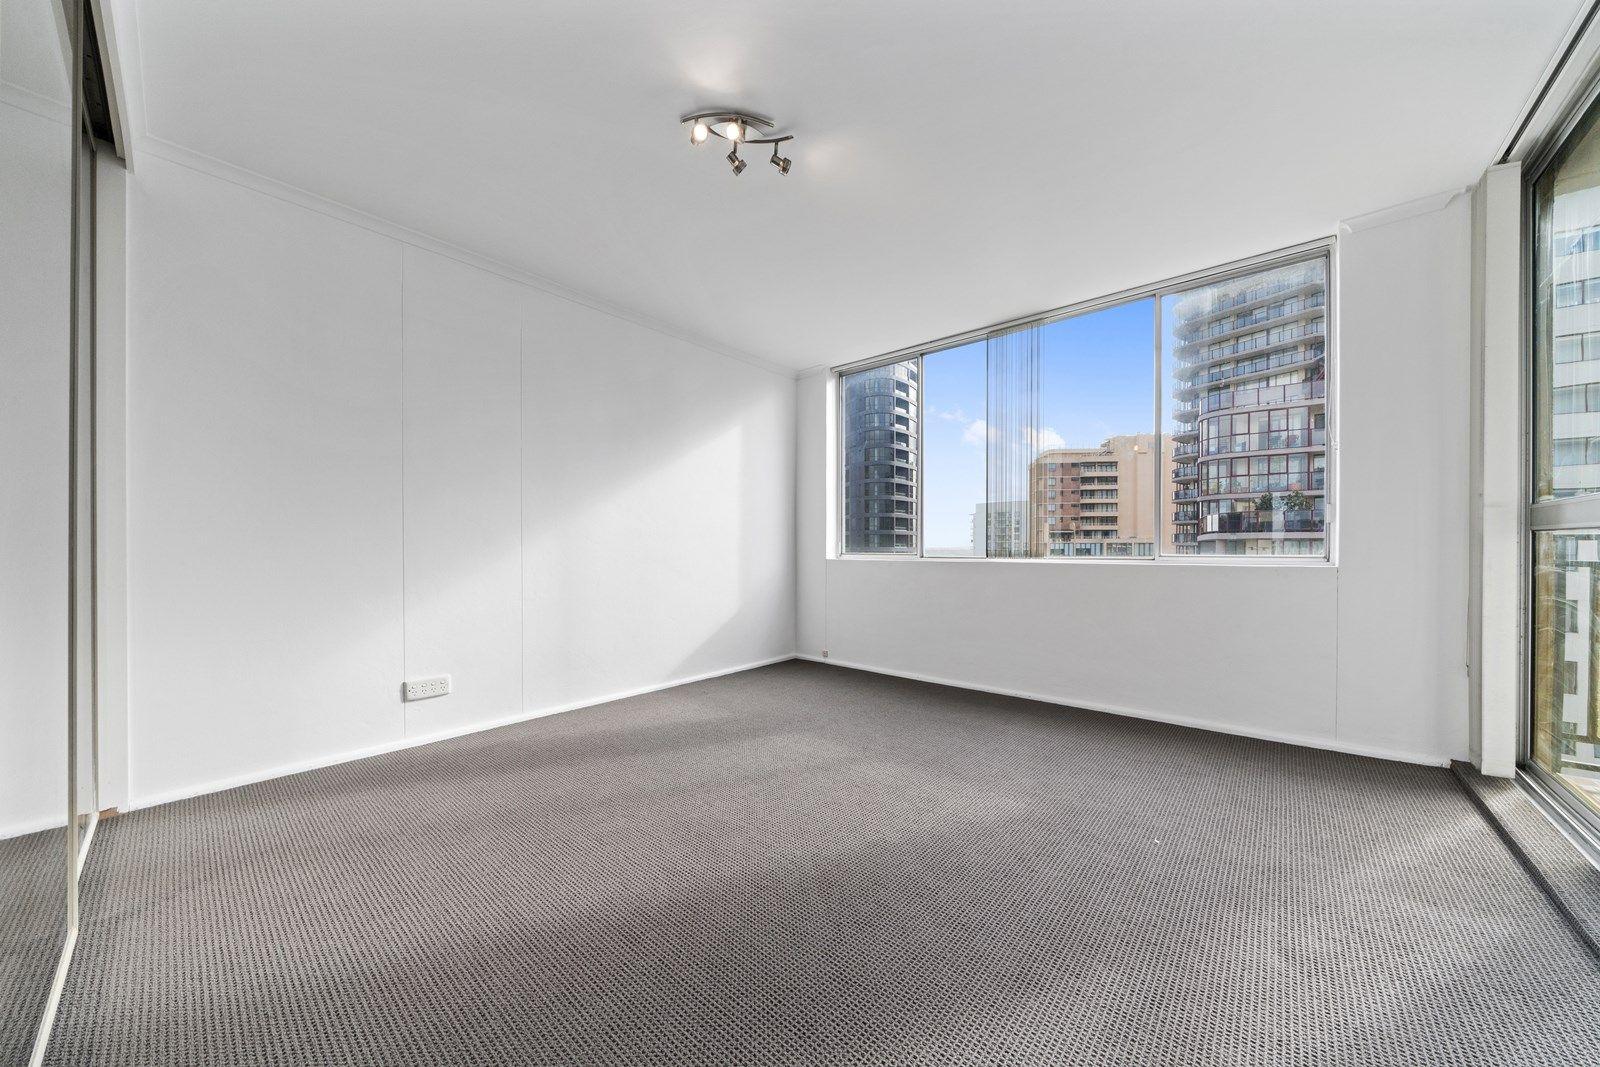 15/21-27 Waverley Street, Bondi Junction NSW 2022, Image 1